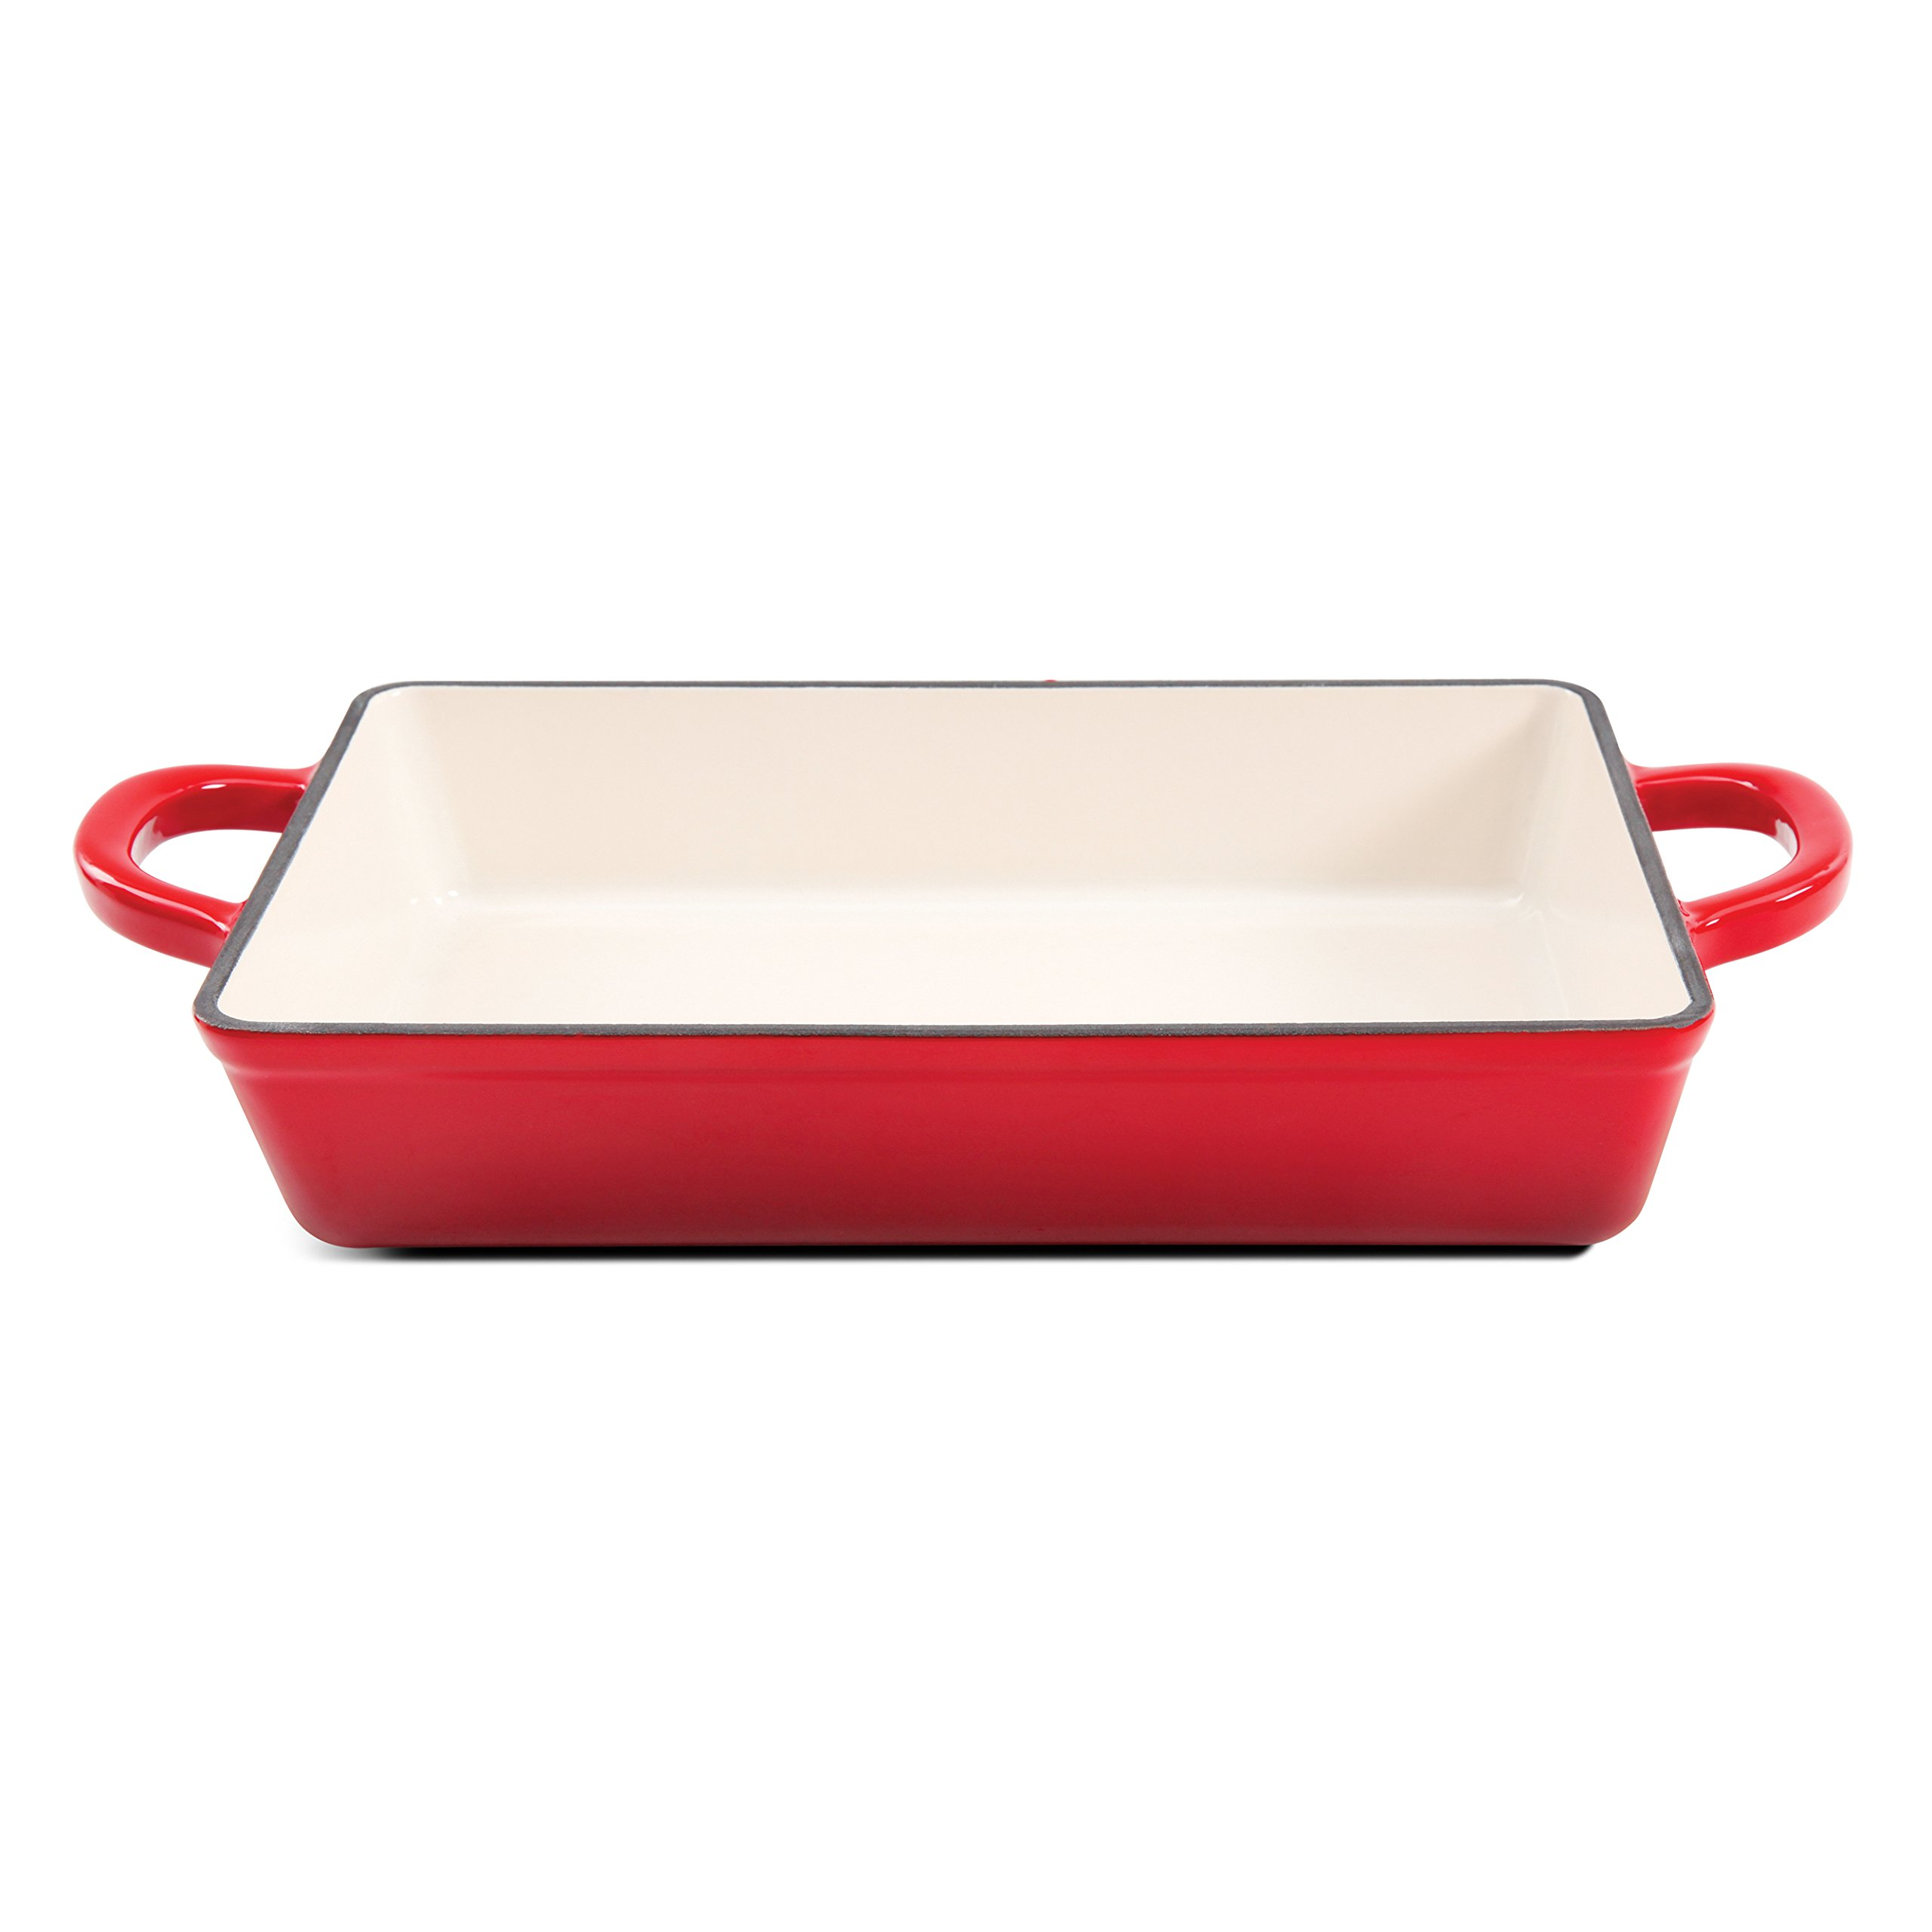 Crock Pot Artisan 13in Enameled Cast Iron Lasagna Pan, Red